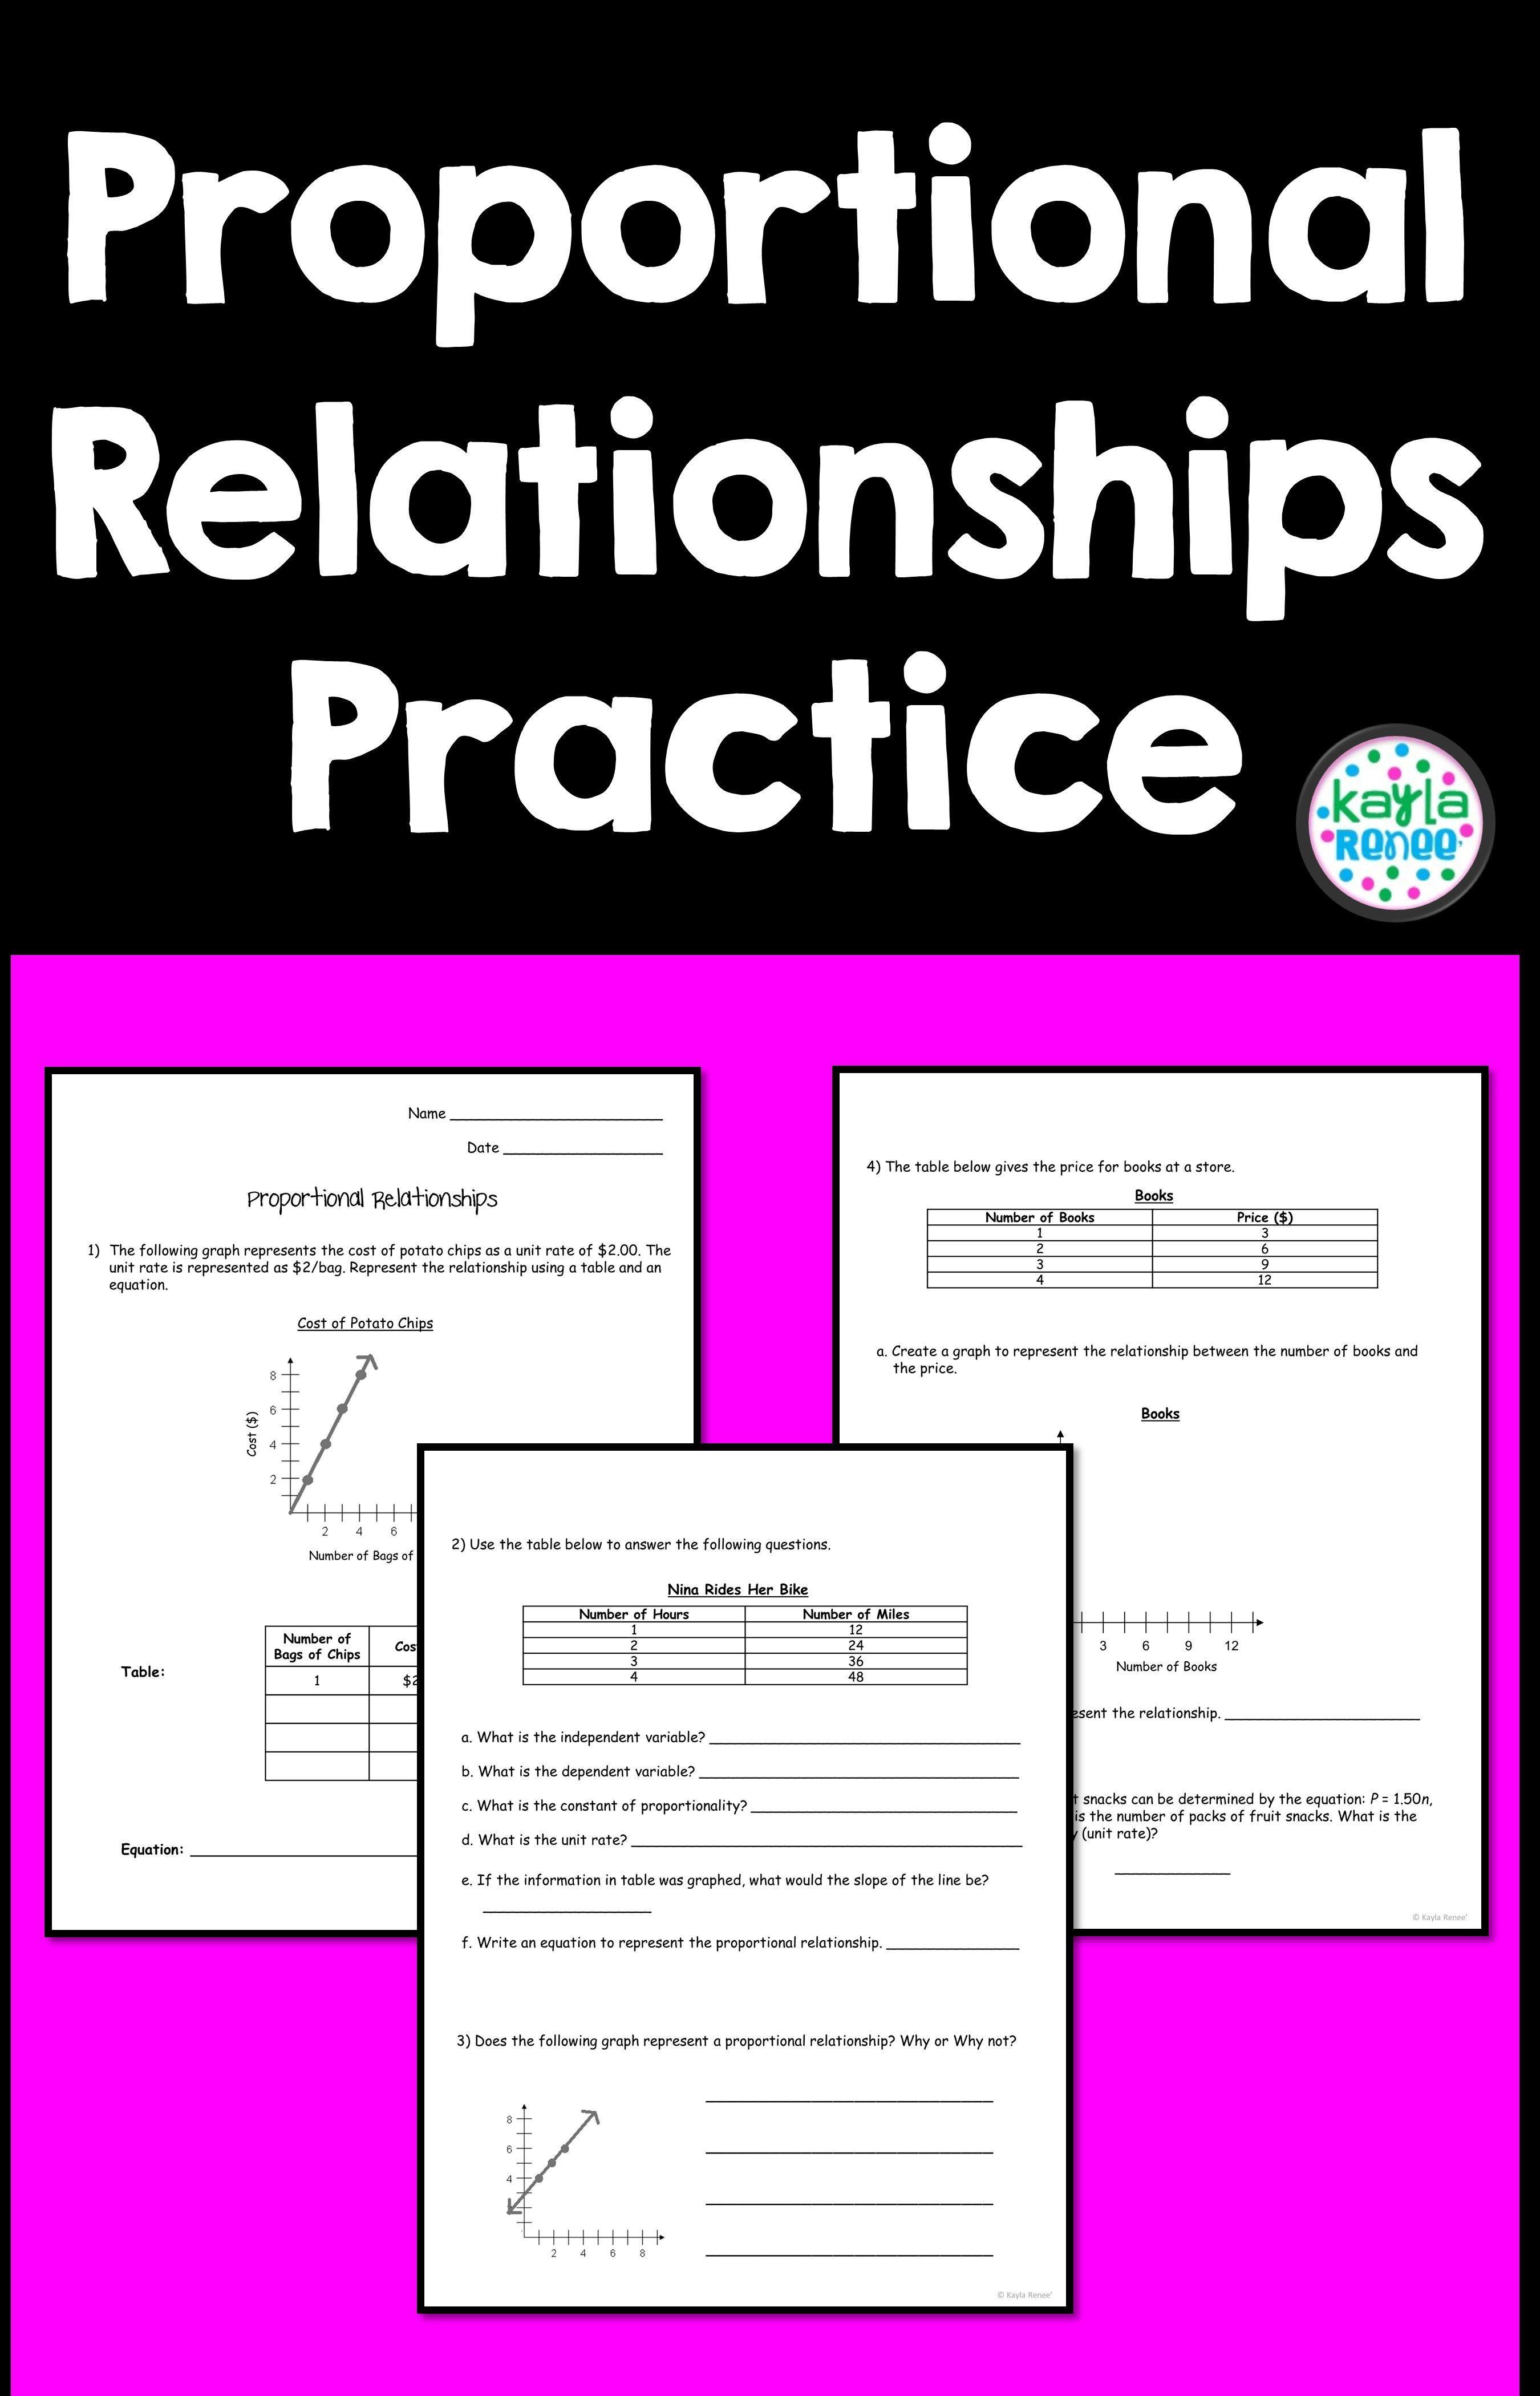 Proportional Relationships Practice Worksheet 7 Rp 2